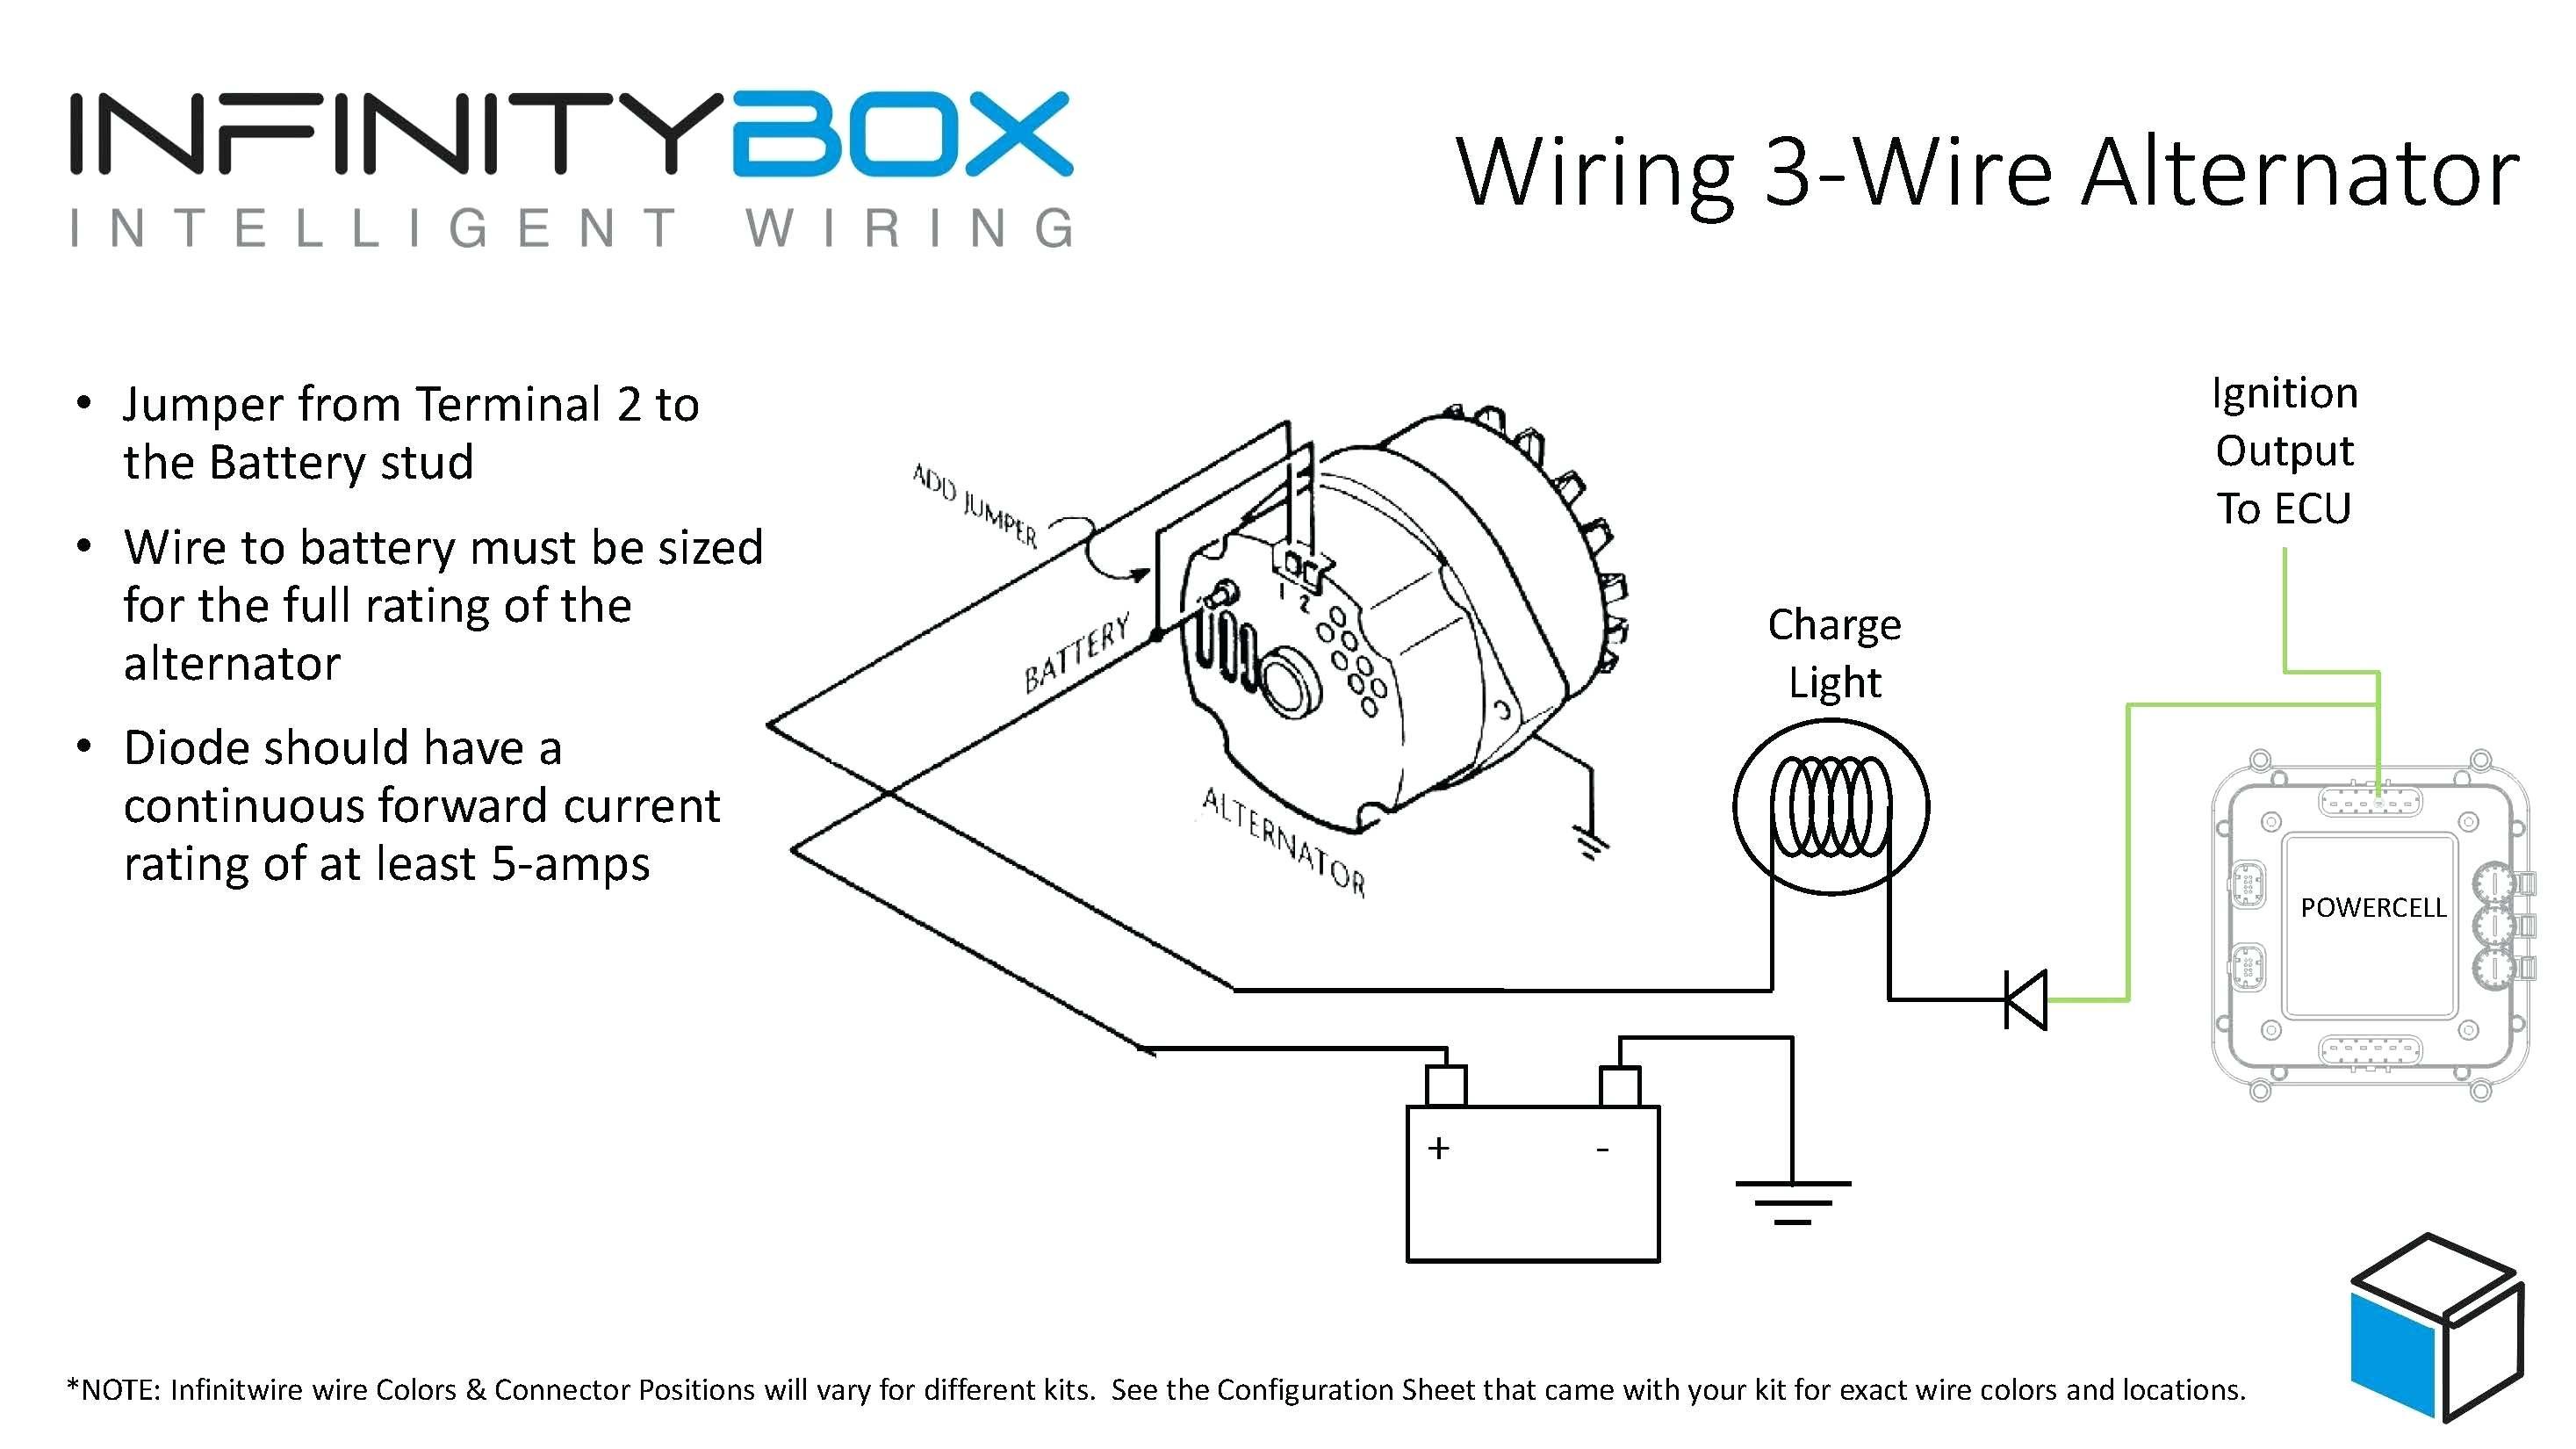 honeywell rth2310b wiring diagram honeywell rth230b wiring diagram e1 wiring diagram  honeywell rth230b wiring diagram e1